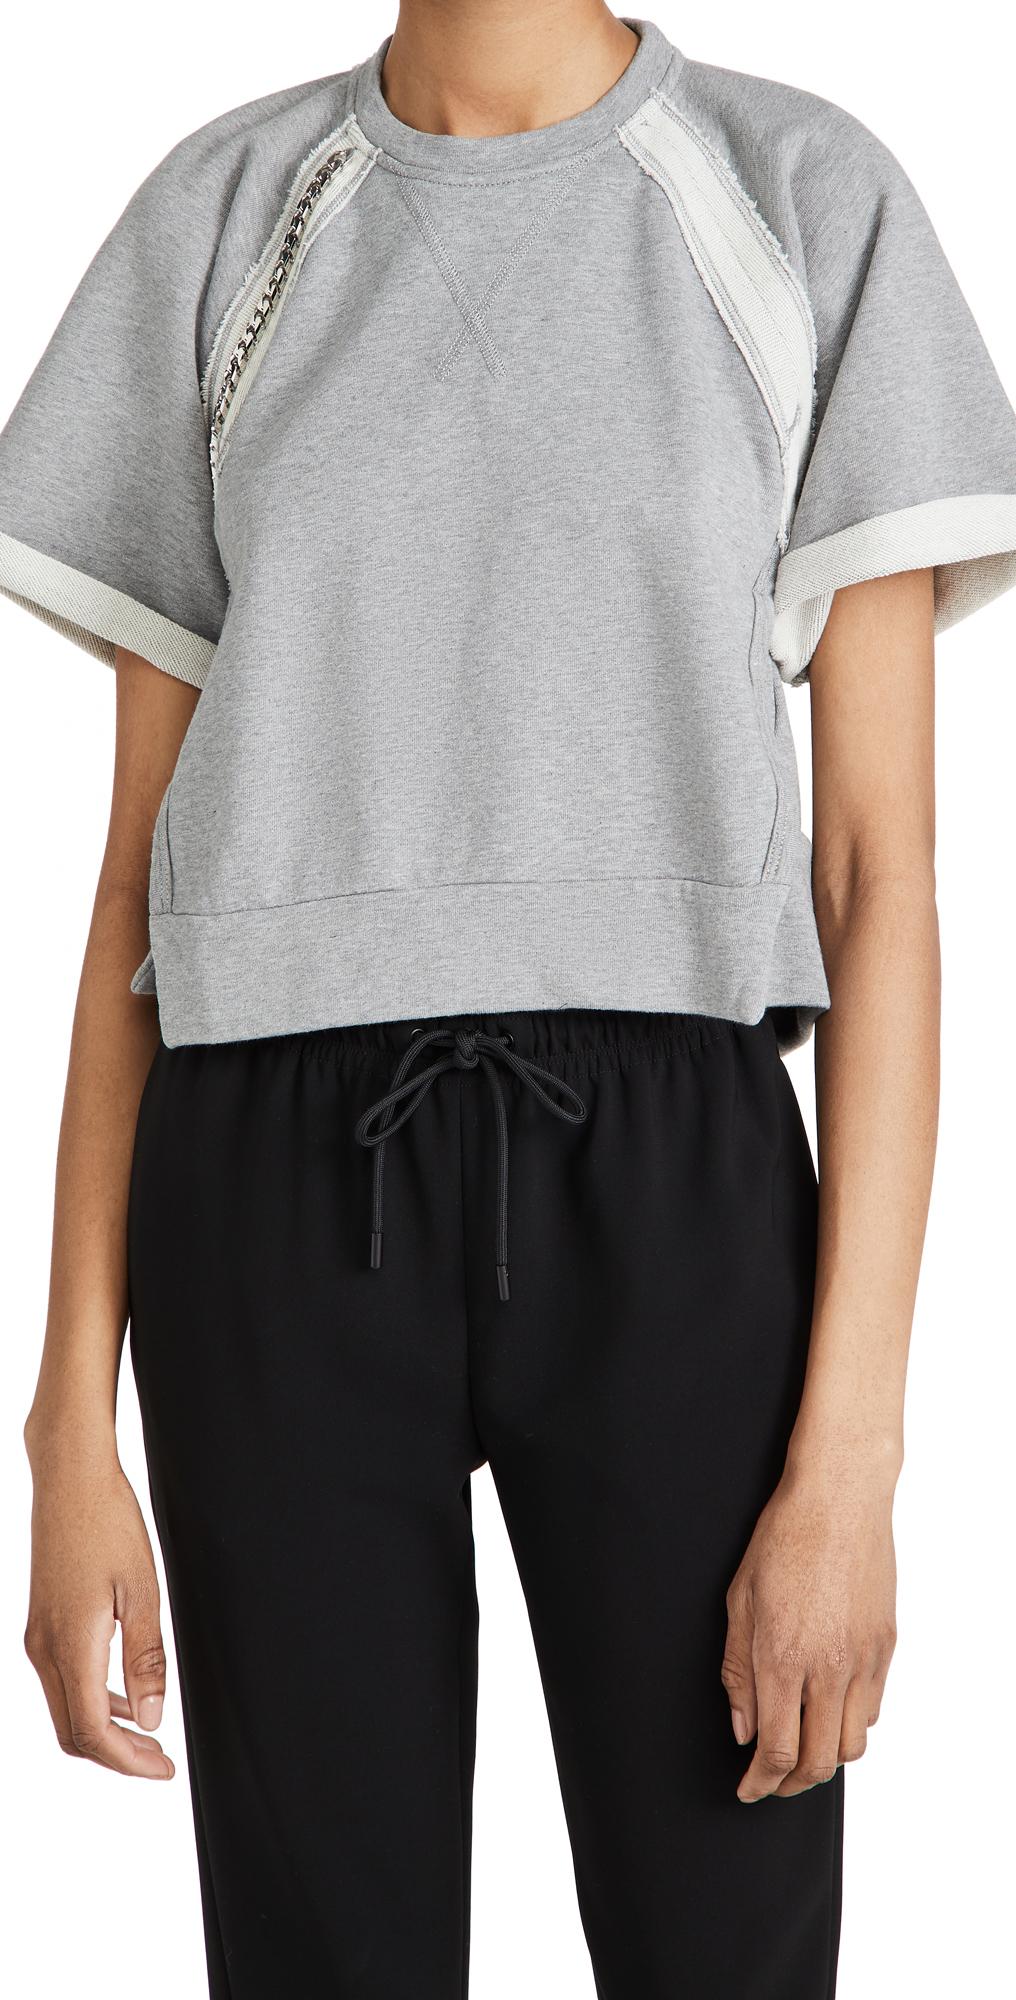 No. 21 Jewel Embellished Short Sleeve Sweatshirt